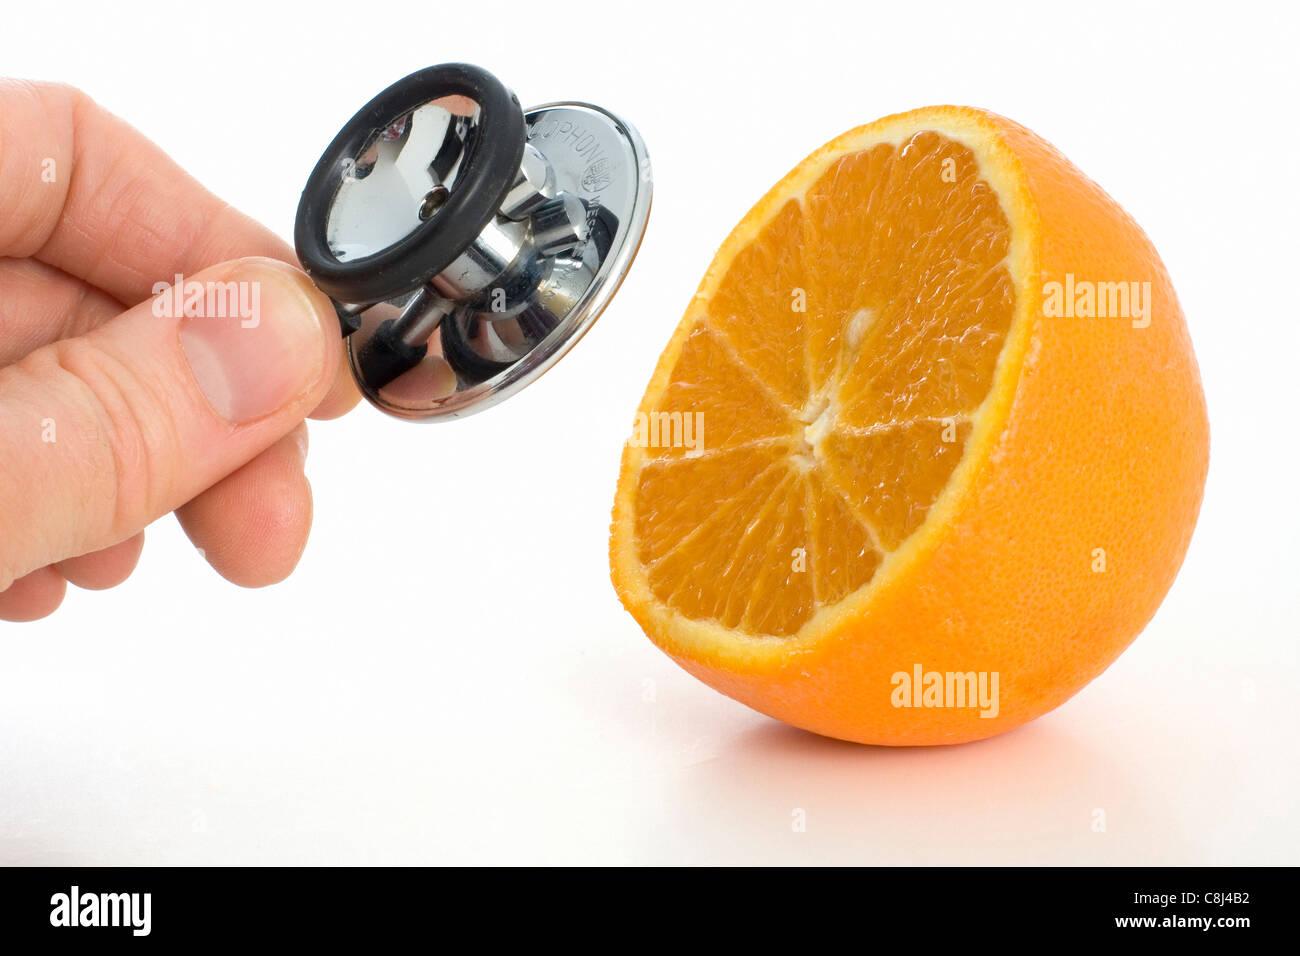 Orange, vitamin, vitamin C, vitamins, rich in vitamins, healthy, health, food, juice, fruit, cold, prevent, stethoscope, - Stock Image